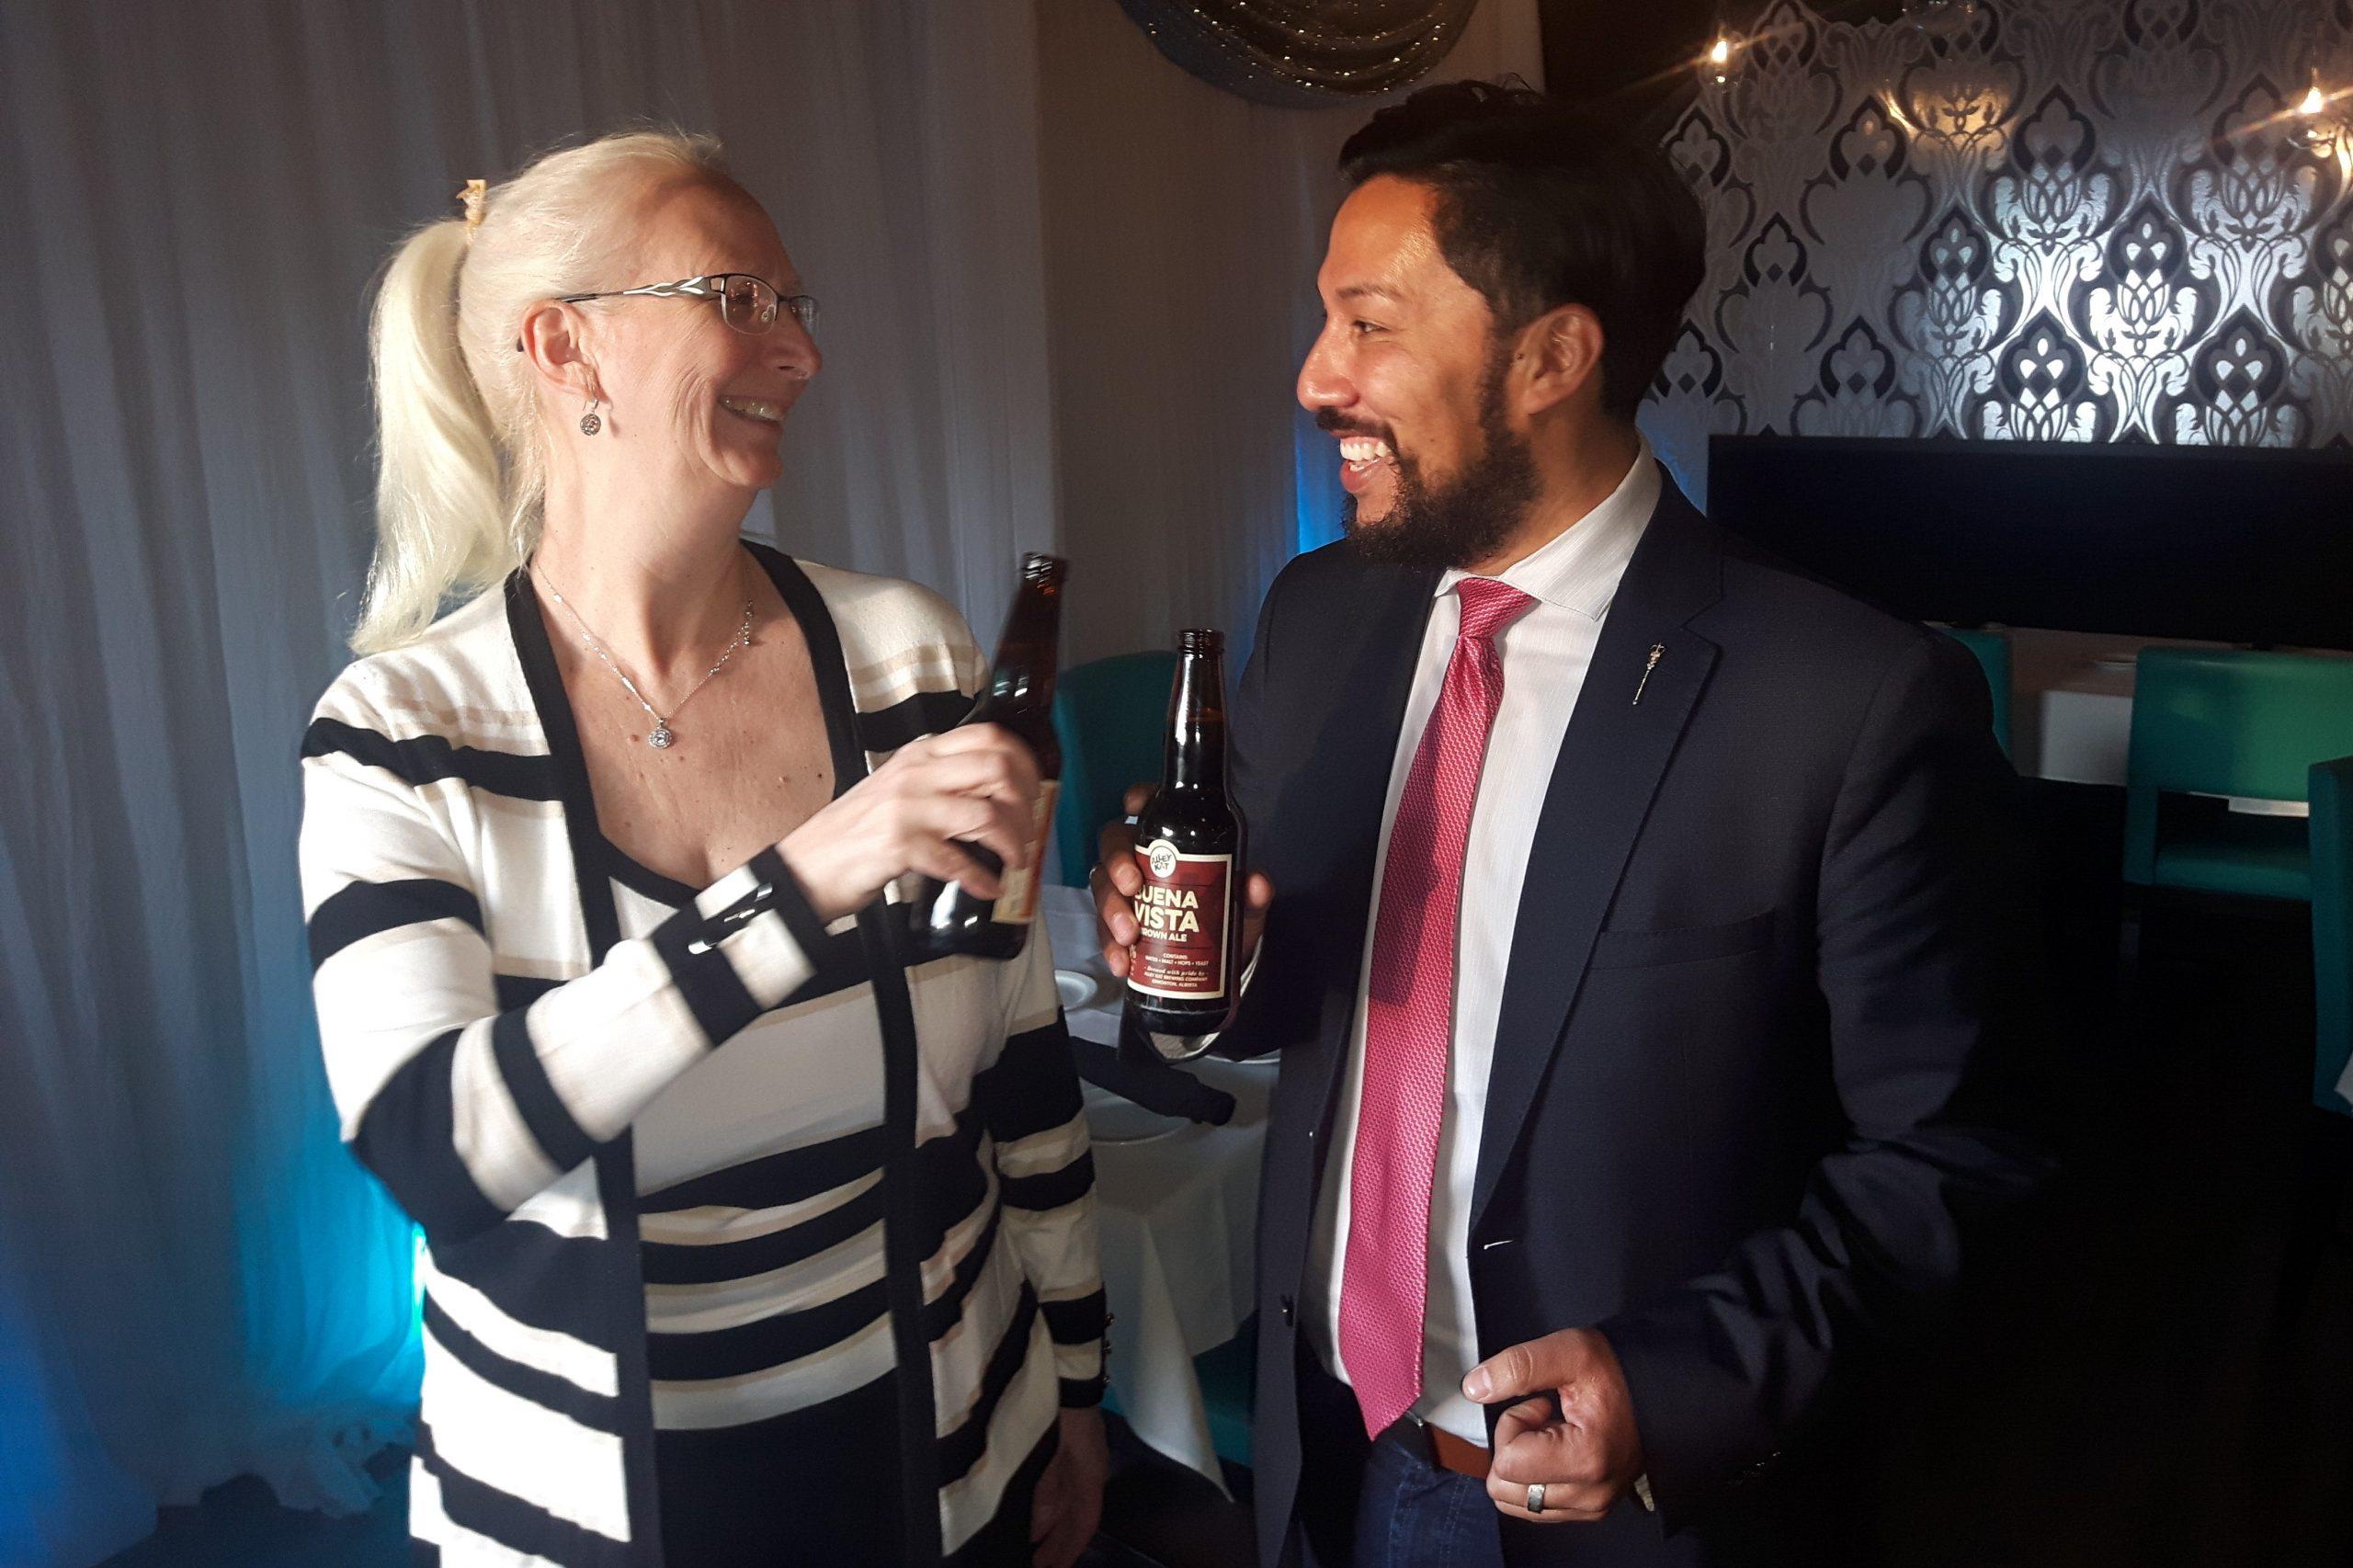 Alberta Salutes Asti Trattoria Owner Over B.C. Wine Ban